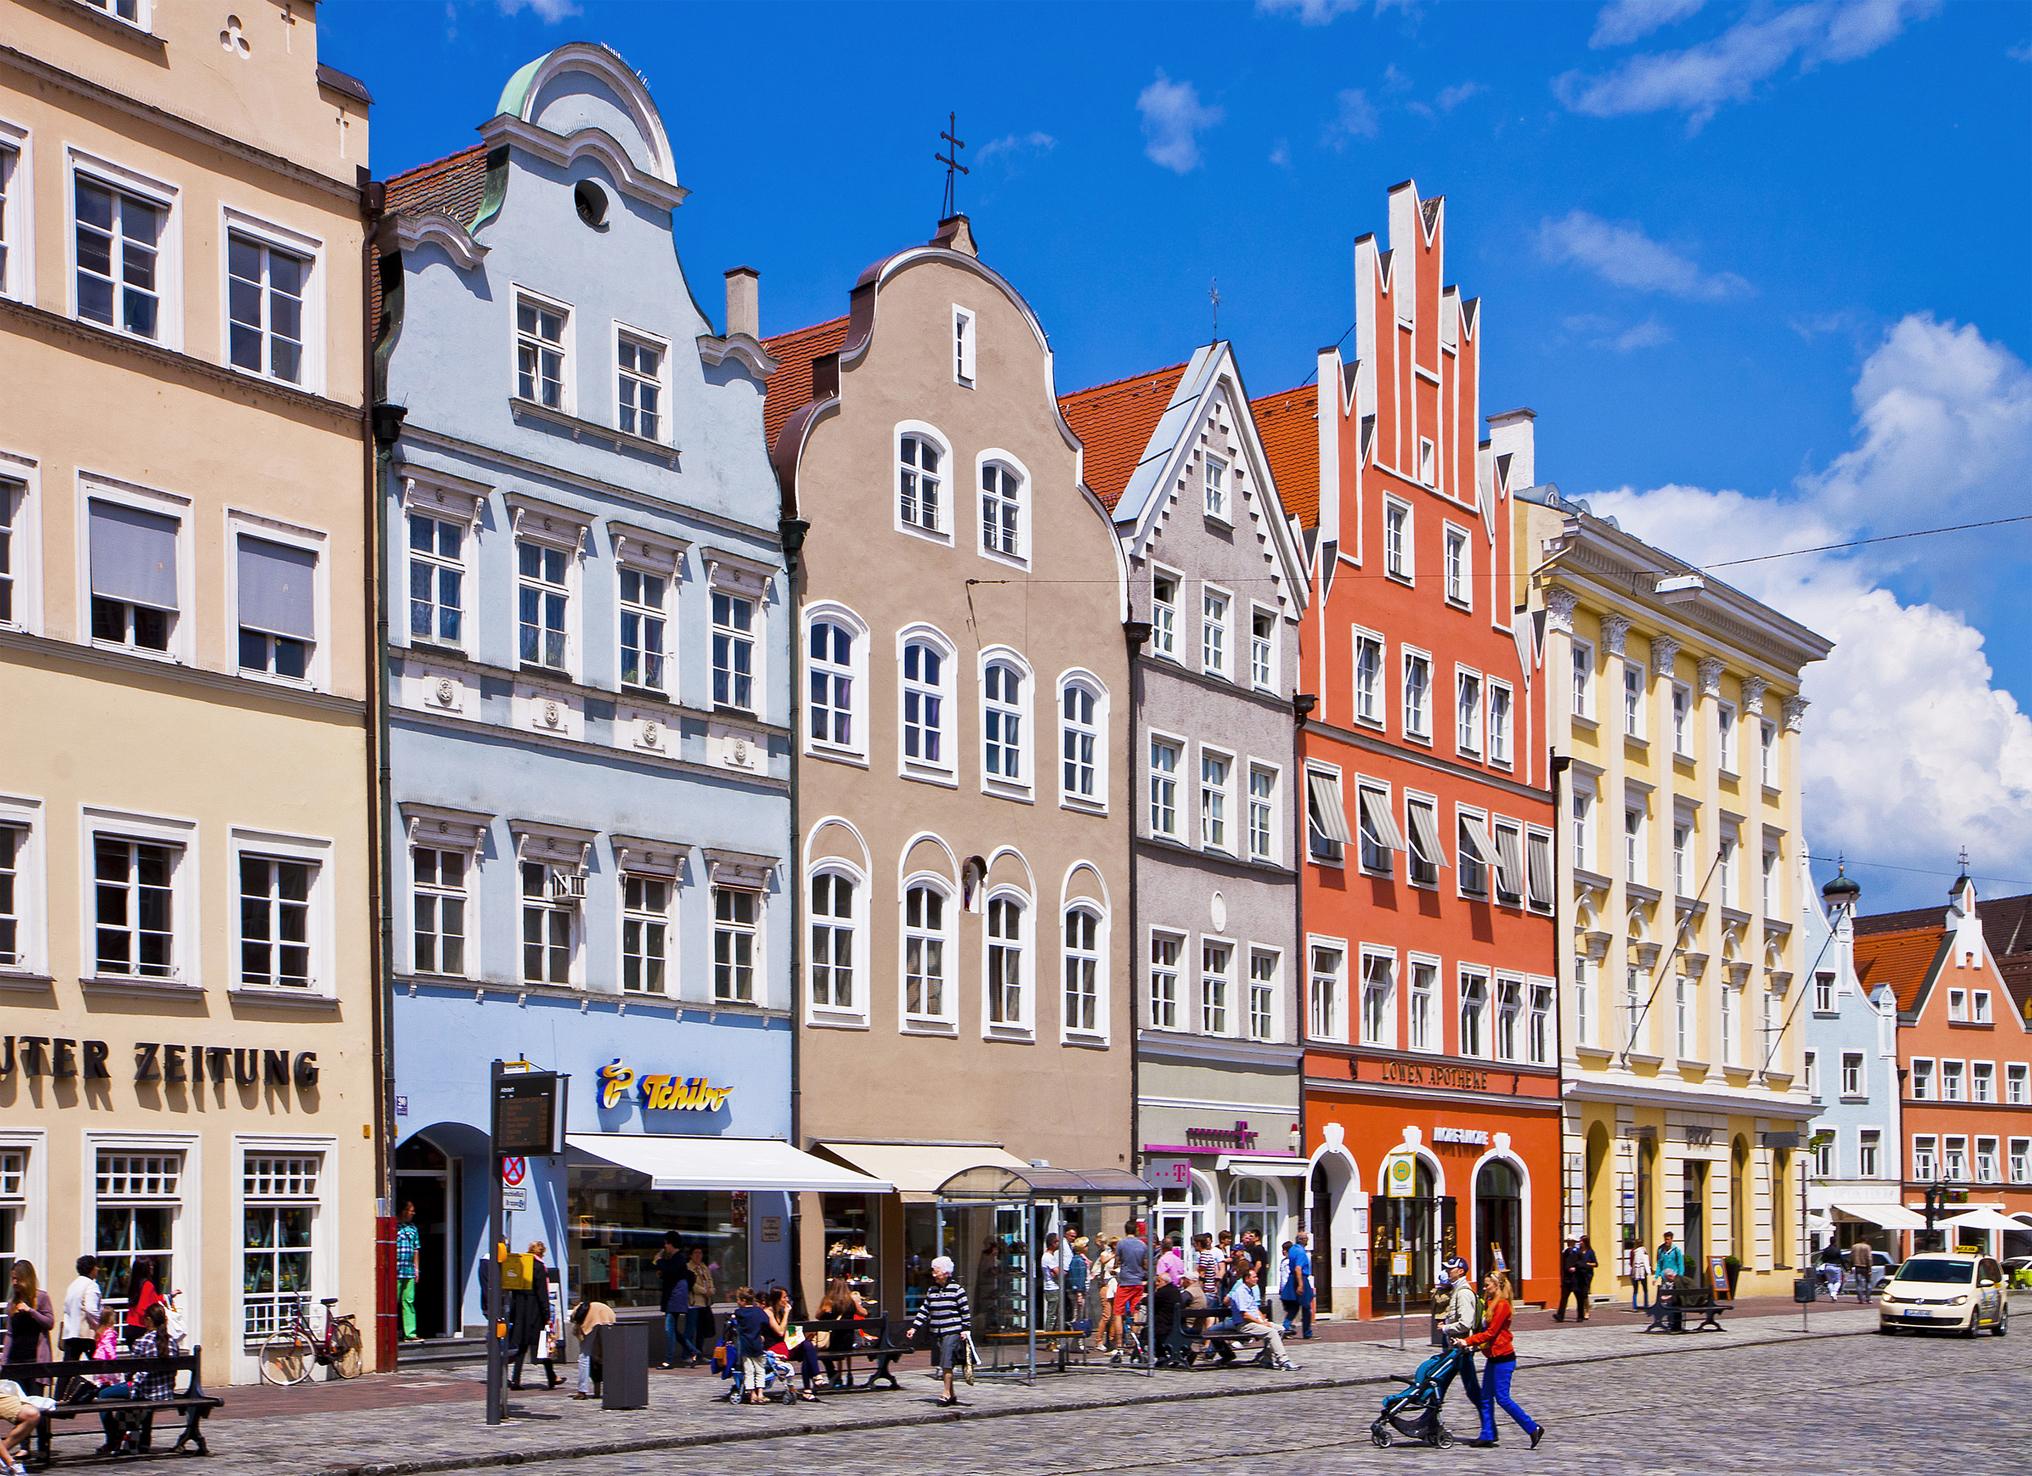 Landshut-germany-town-bavaria.jpg?mtime=20190228122309#asset:105029